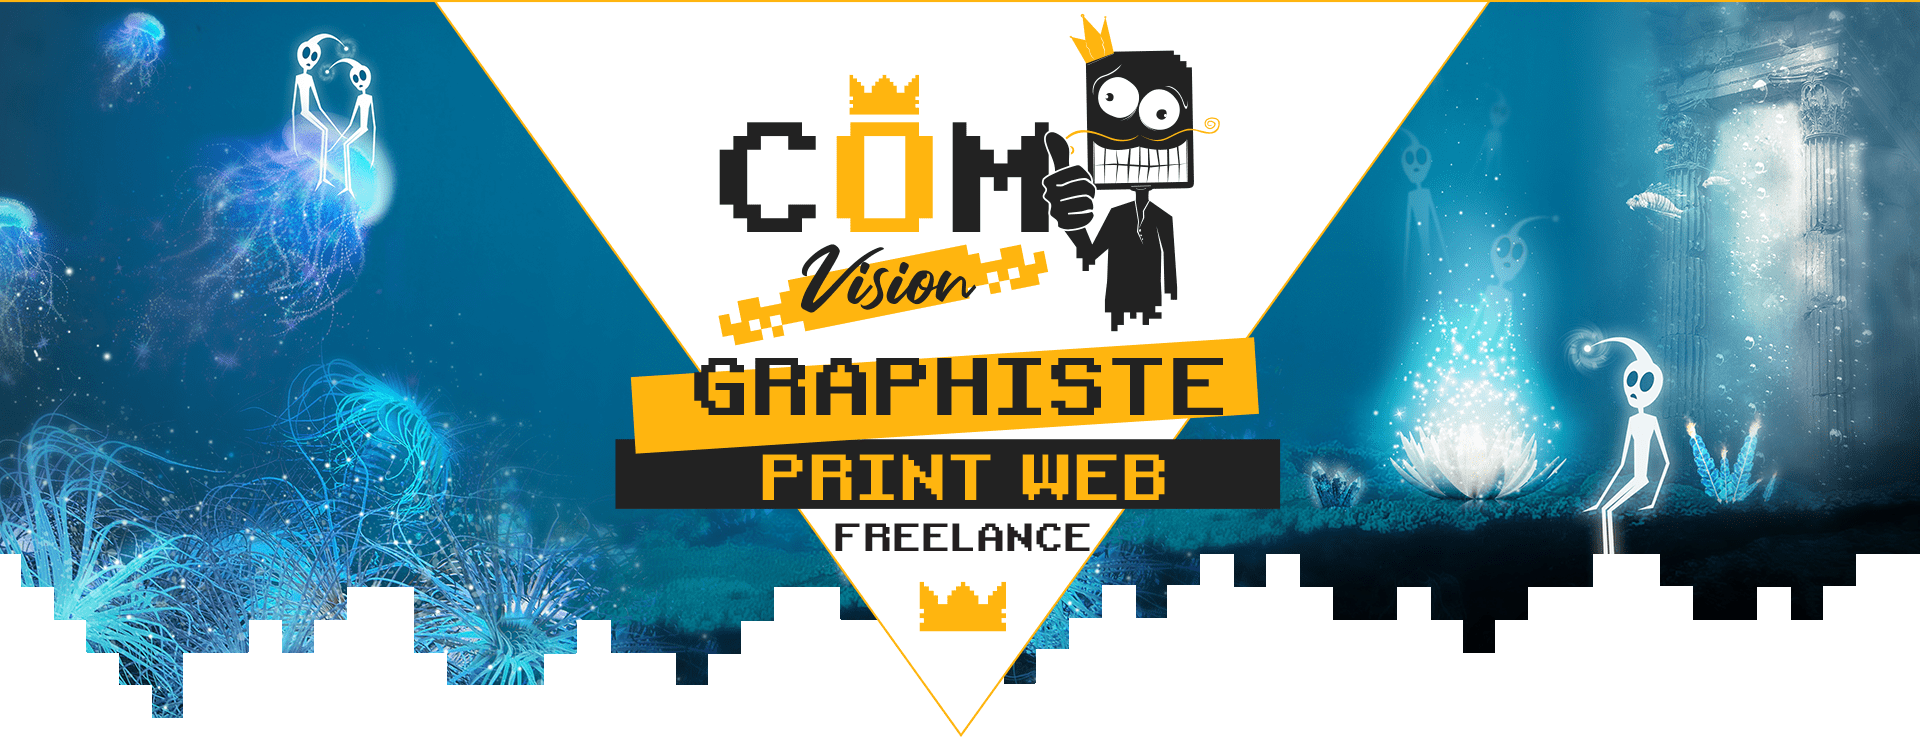 com1vision graphiste print web